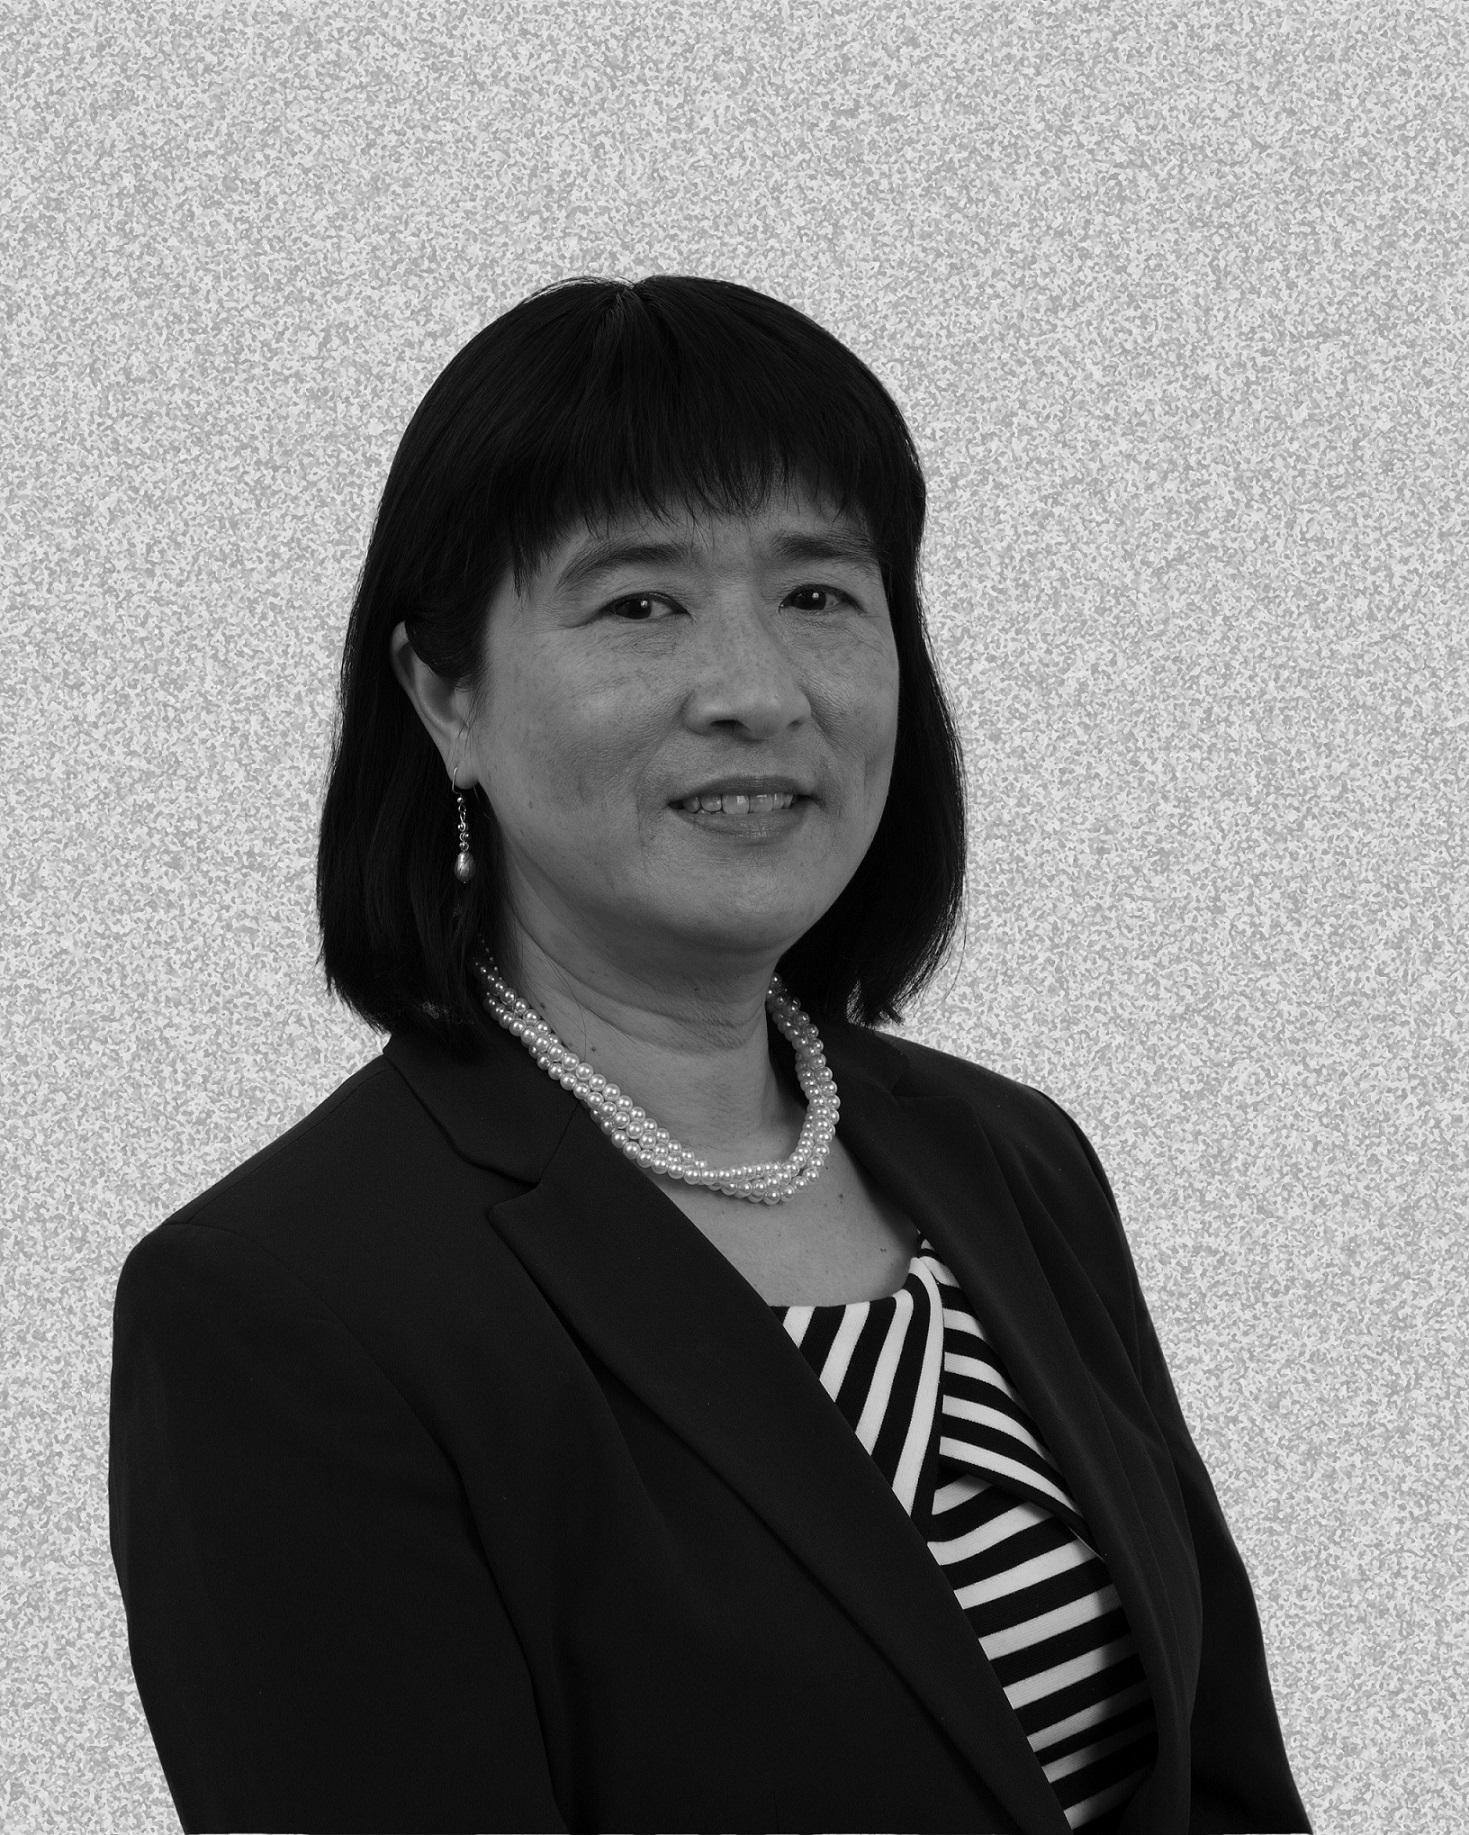 Louisa Kwan-au-yang